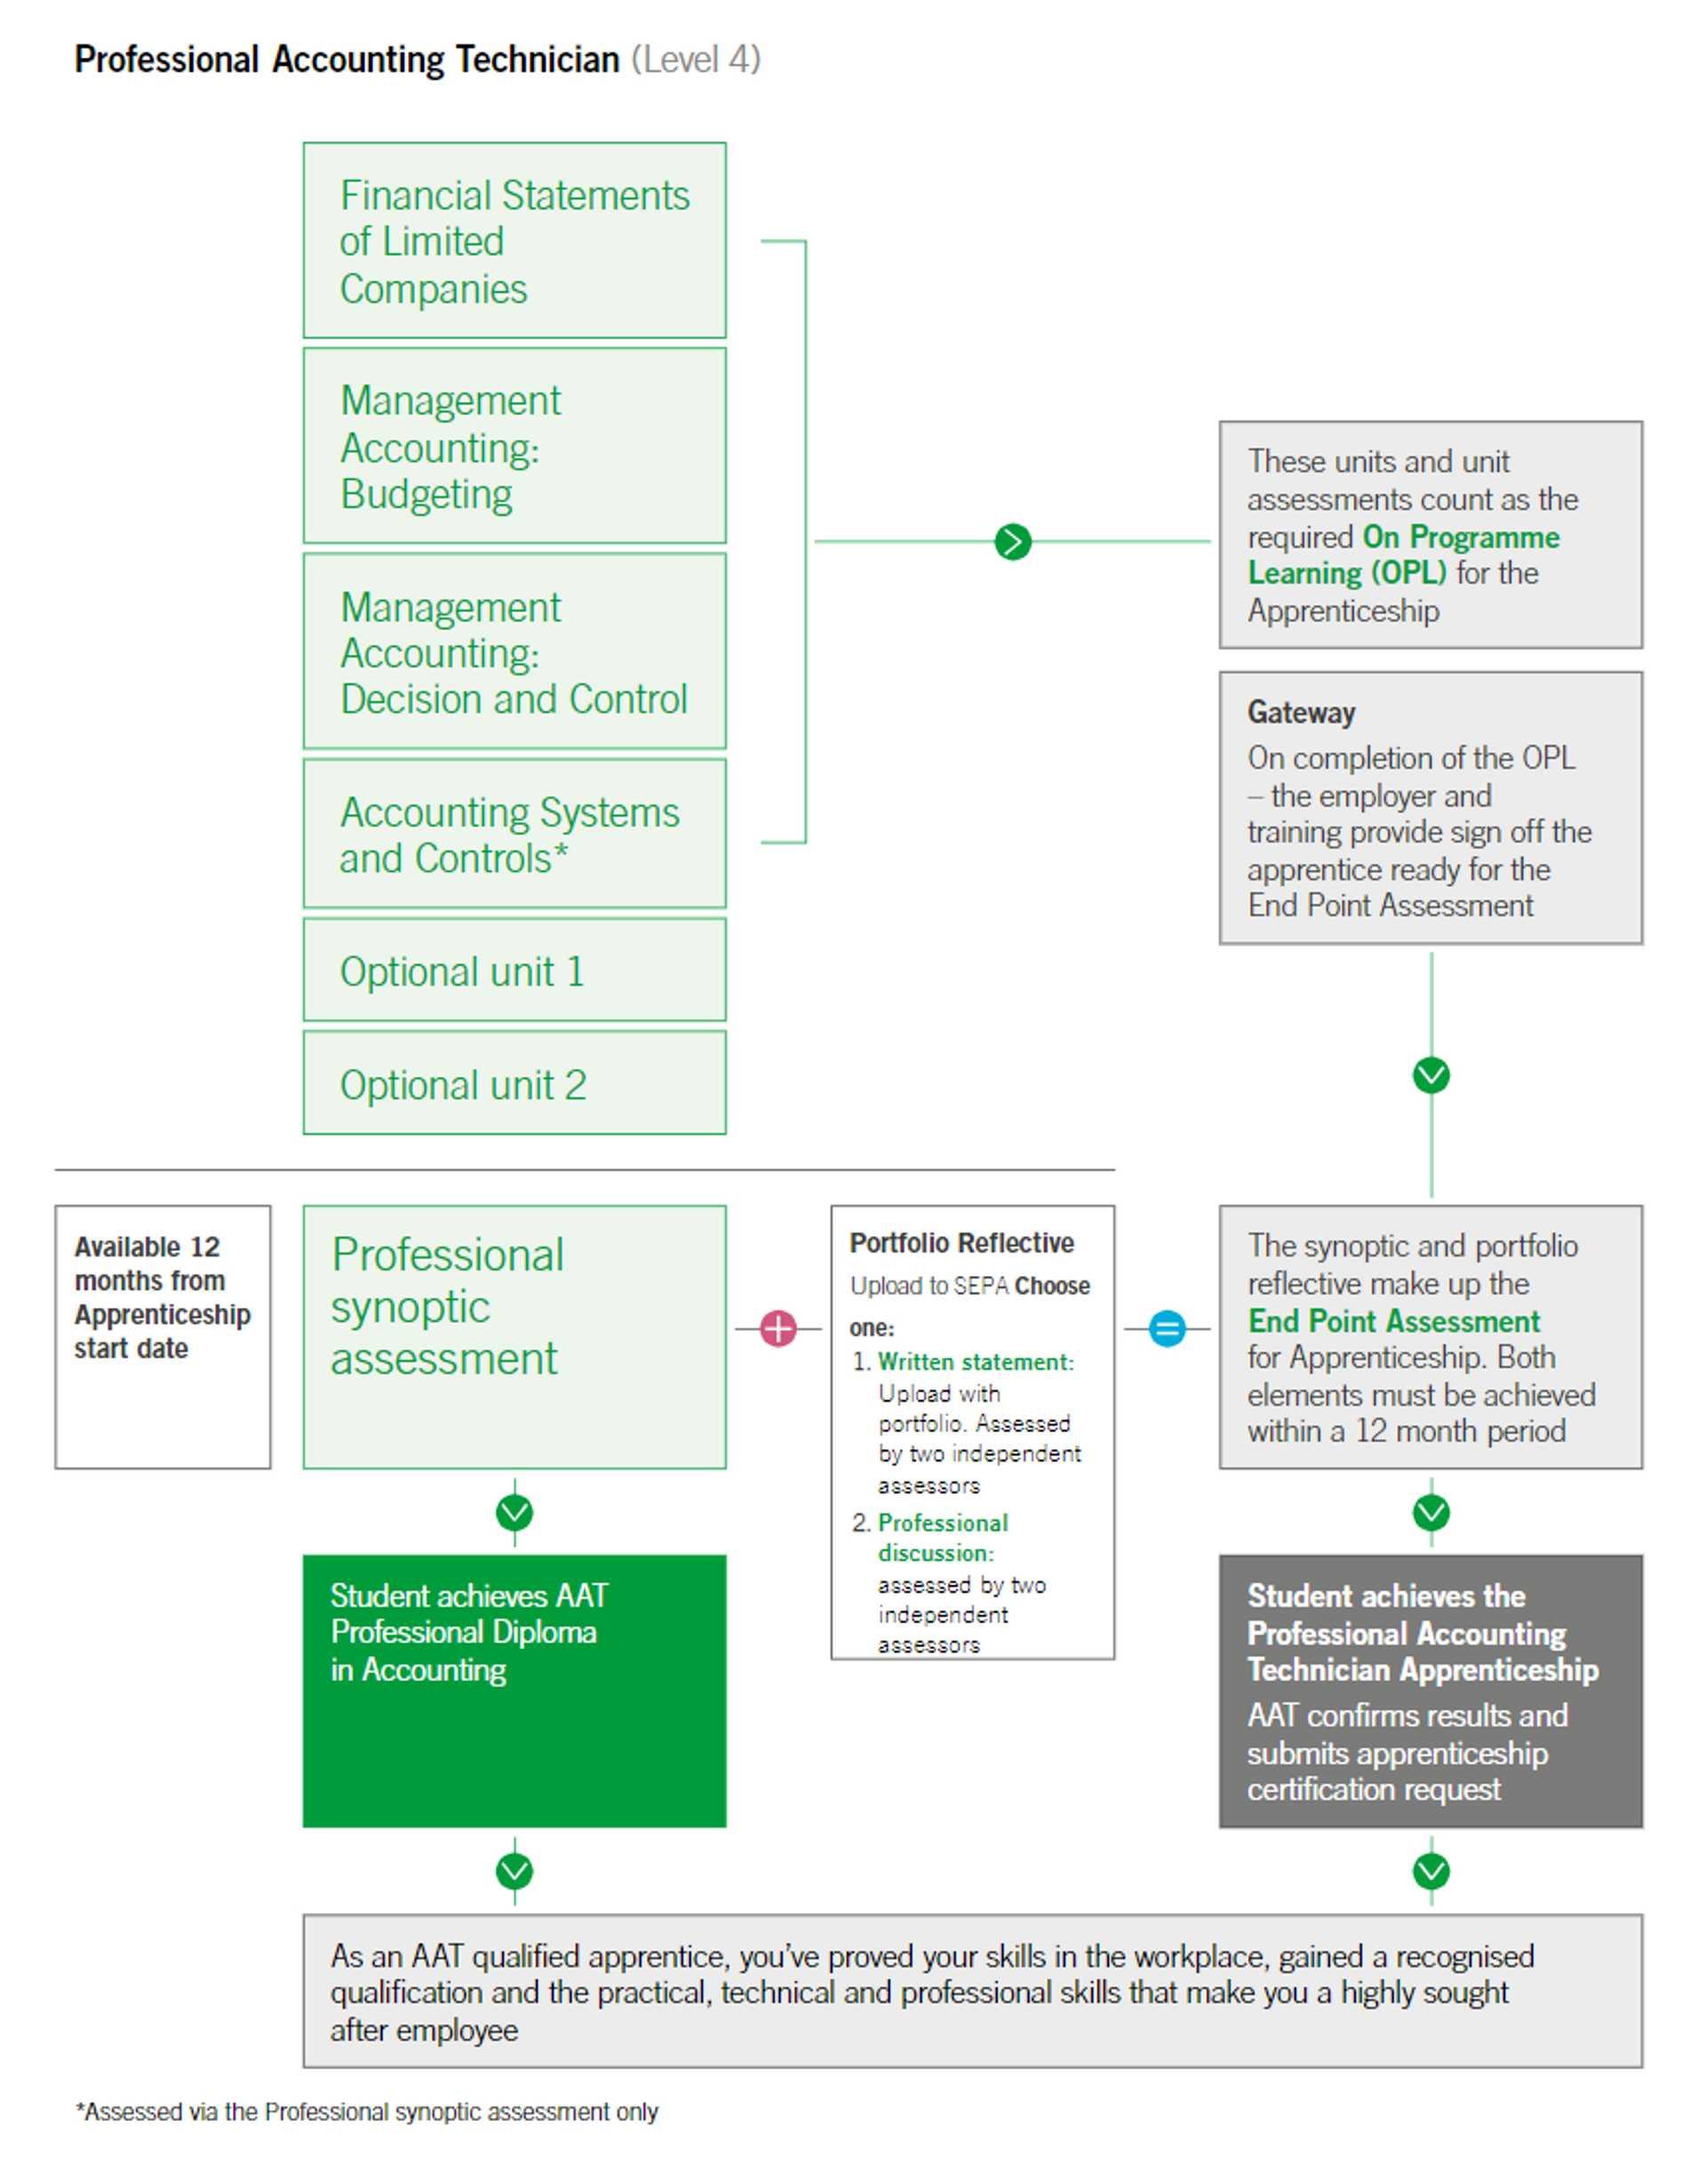 Professional Accounting Technician apprenticeship EPA pathway